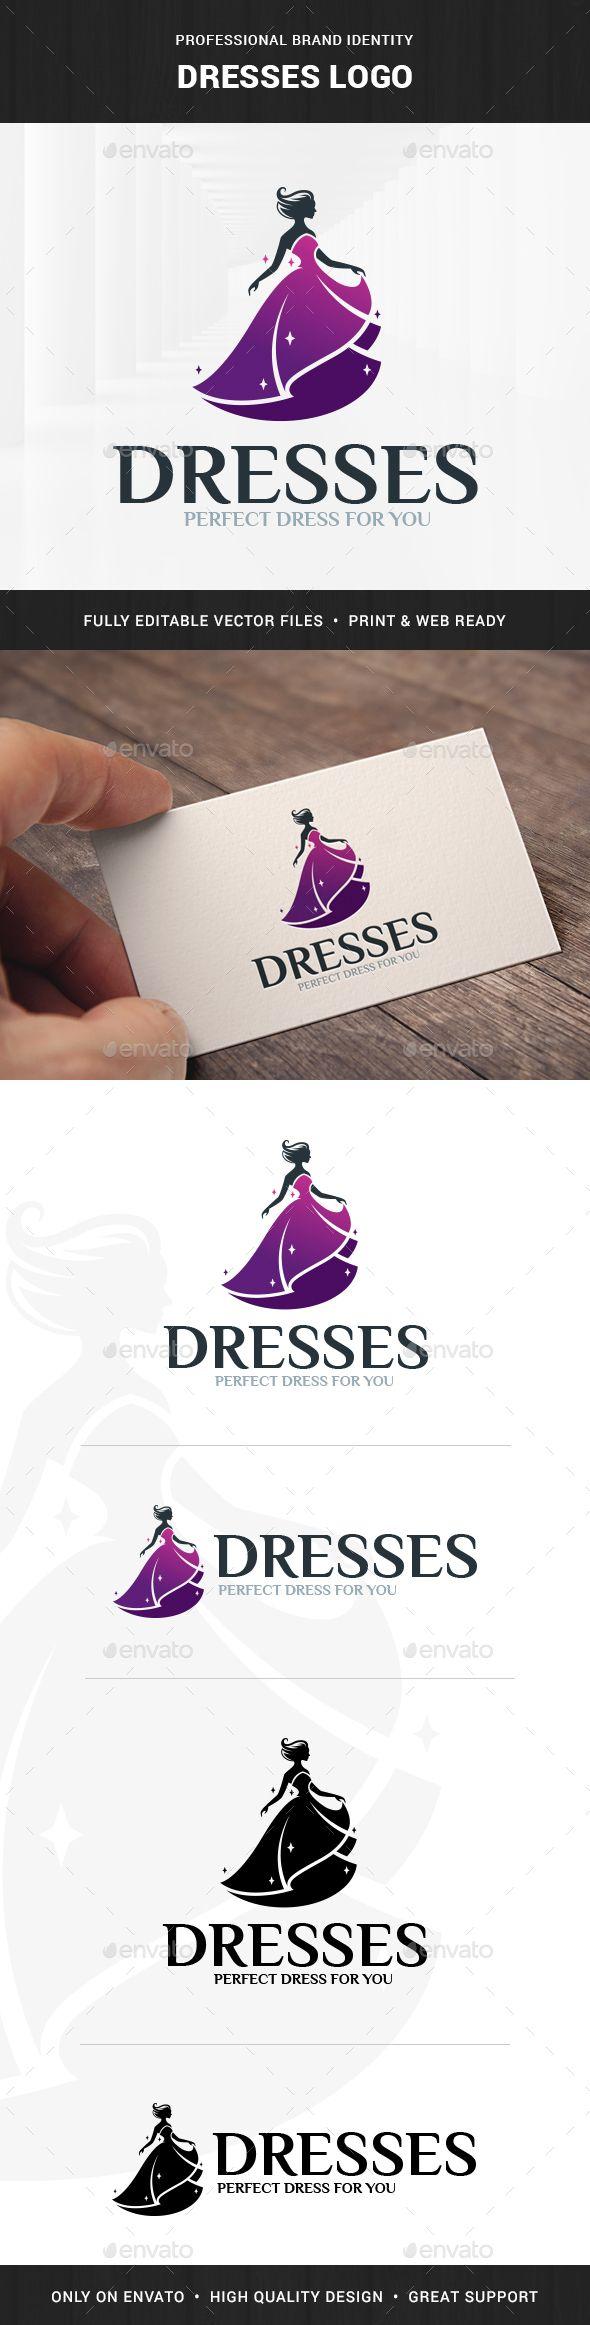 Dresses Logo Template Vector EPS, AI Illustrator Dress